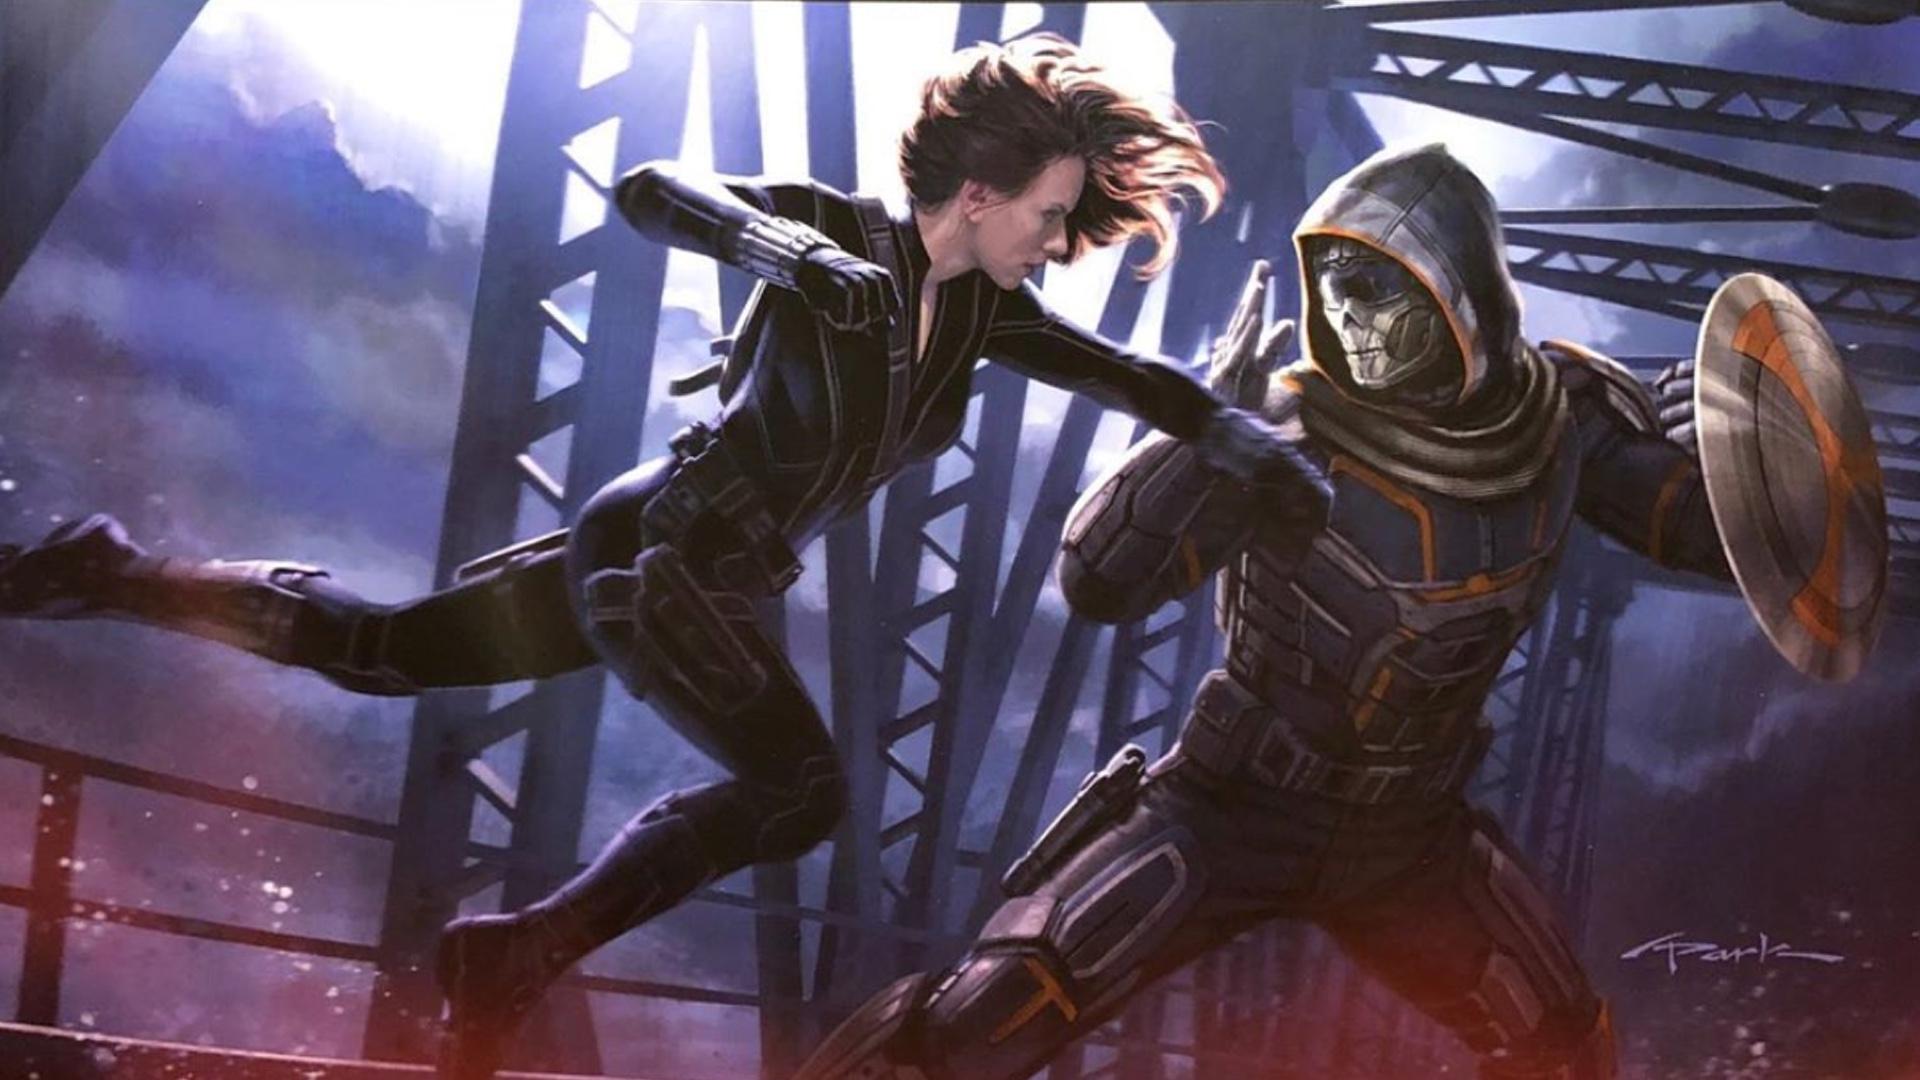 BLACK WIDOW Movie Poster Art Shows Black Widow Fighting Taskmaster 1920x1080